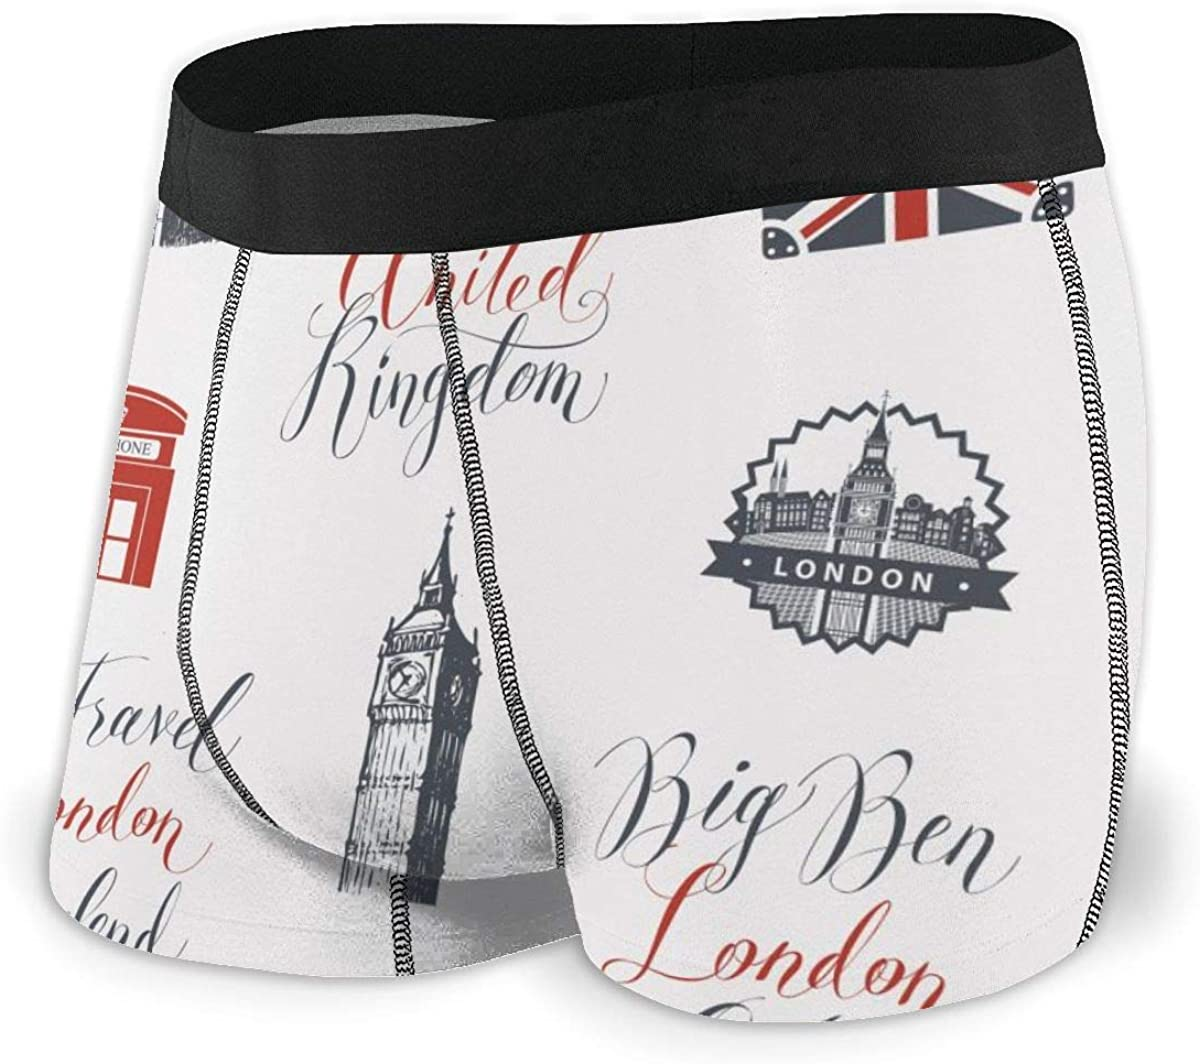 Randolph Wordsworth Mens Boxer Briefs Vector Seamless UK and London Breathable Underwear